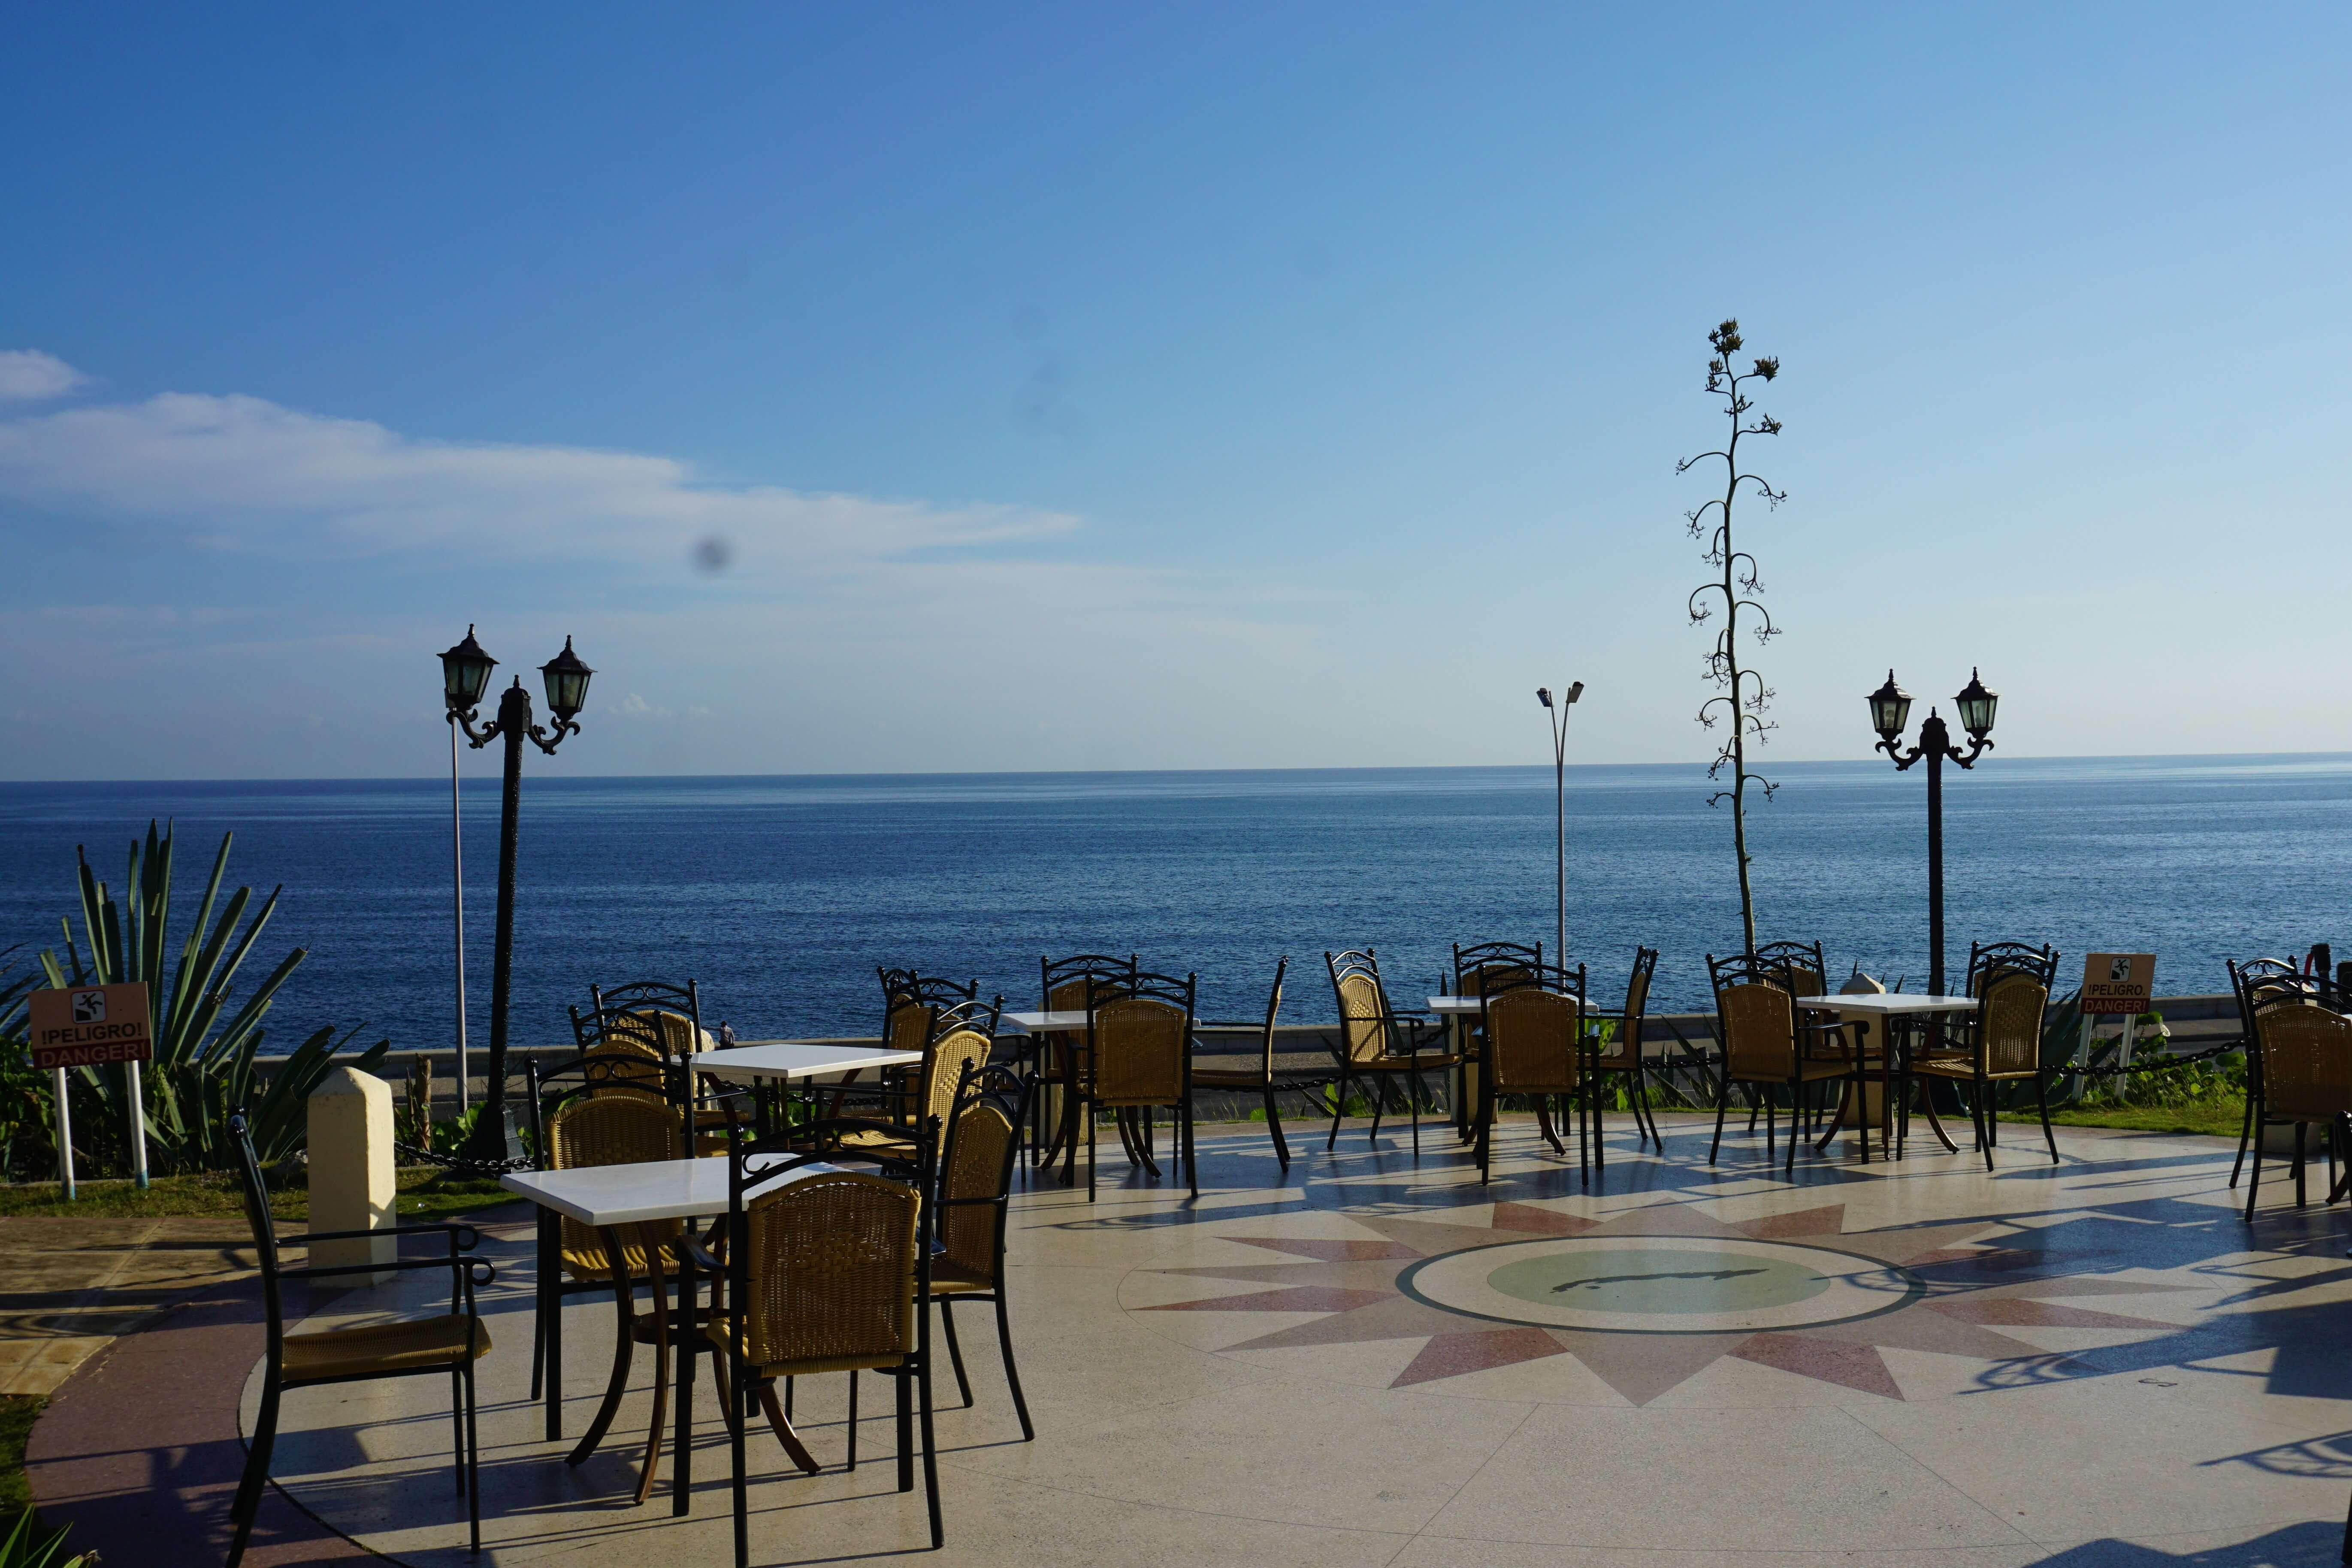 Ocean view from patio of Hotel Nacional de Cuba